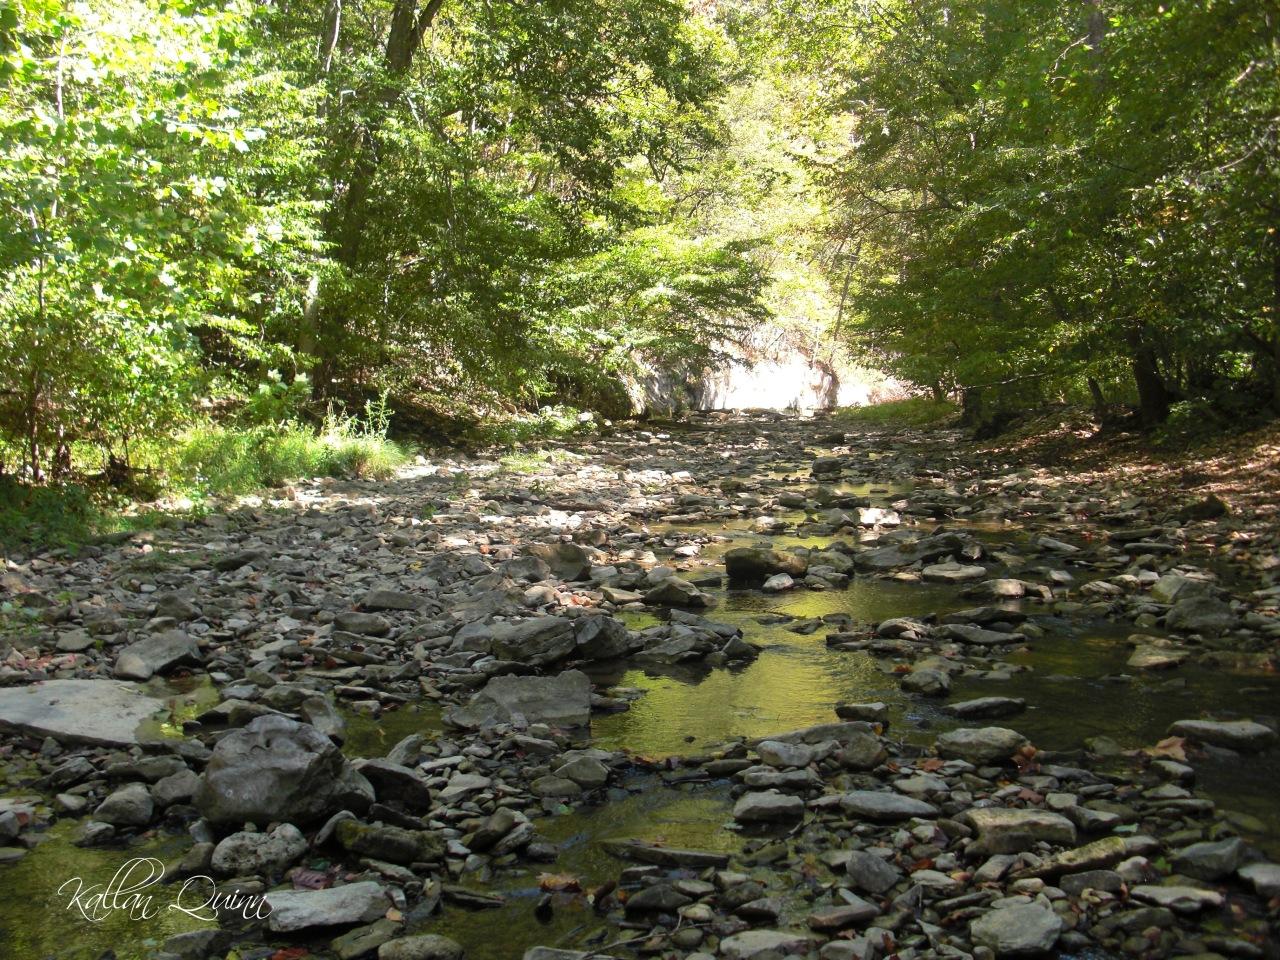 McCormicks State Park